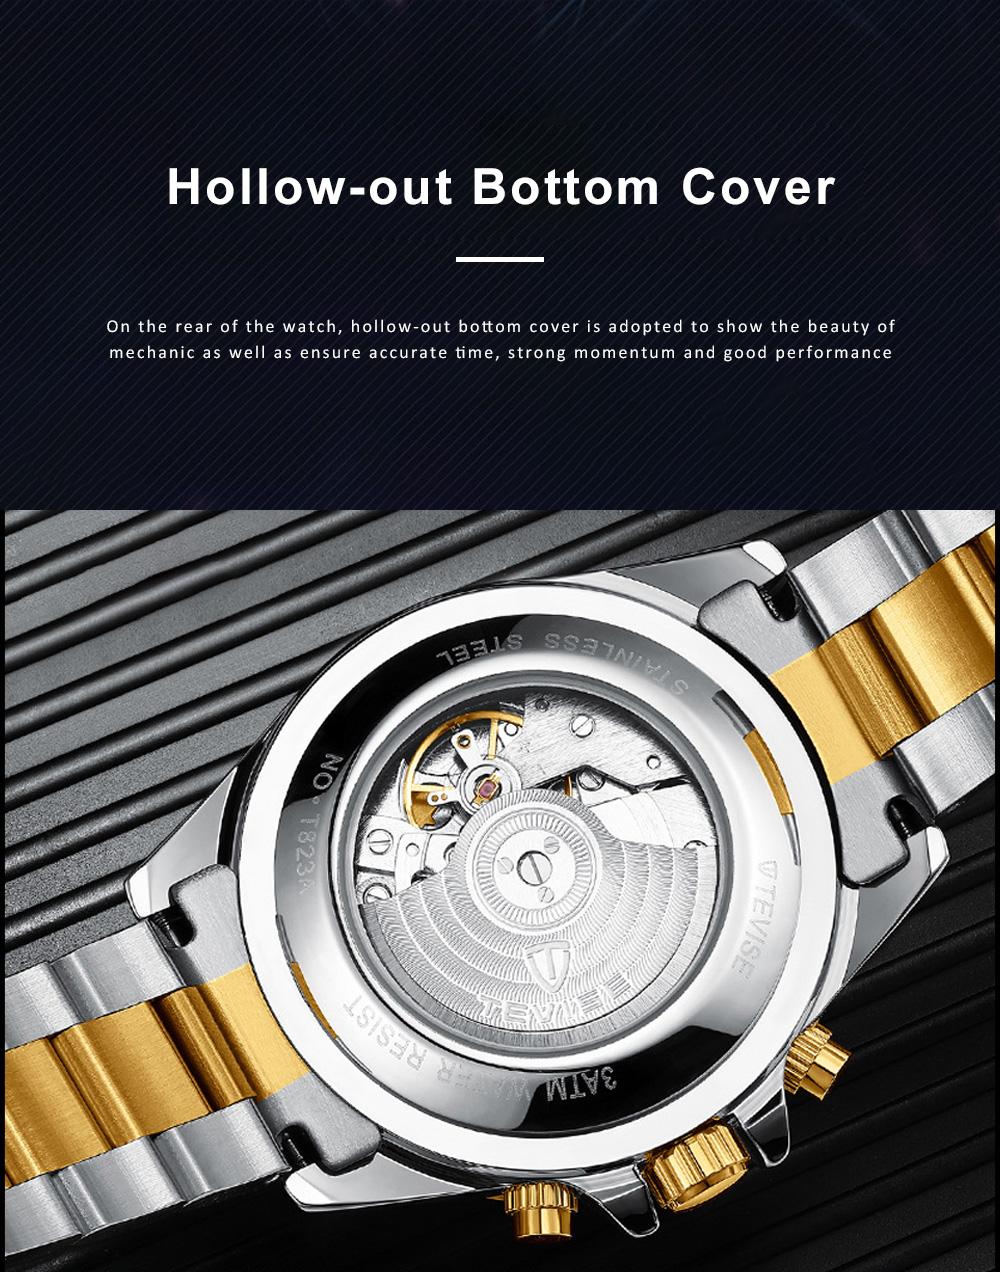 Night Luminous Mechanical Men's Watch Multifunctional Waterproof Wrist Watch for Businessman 2